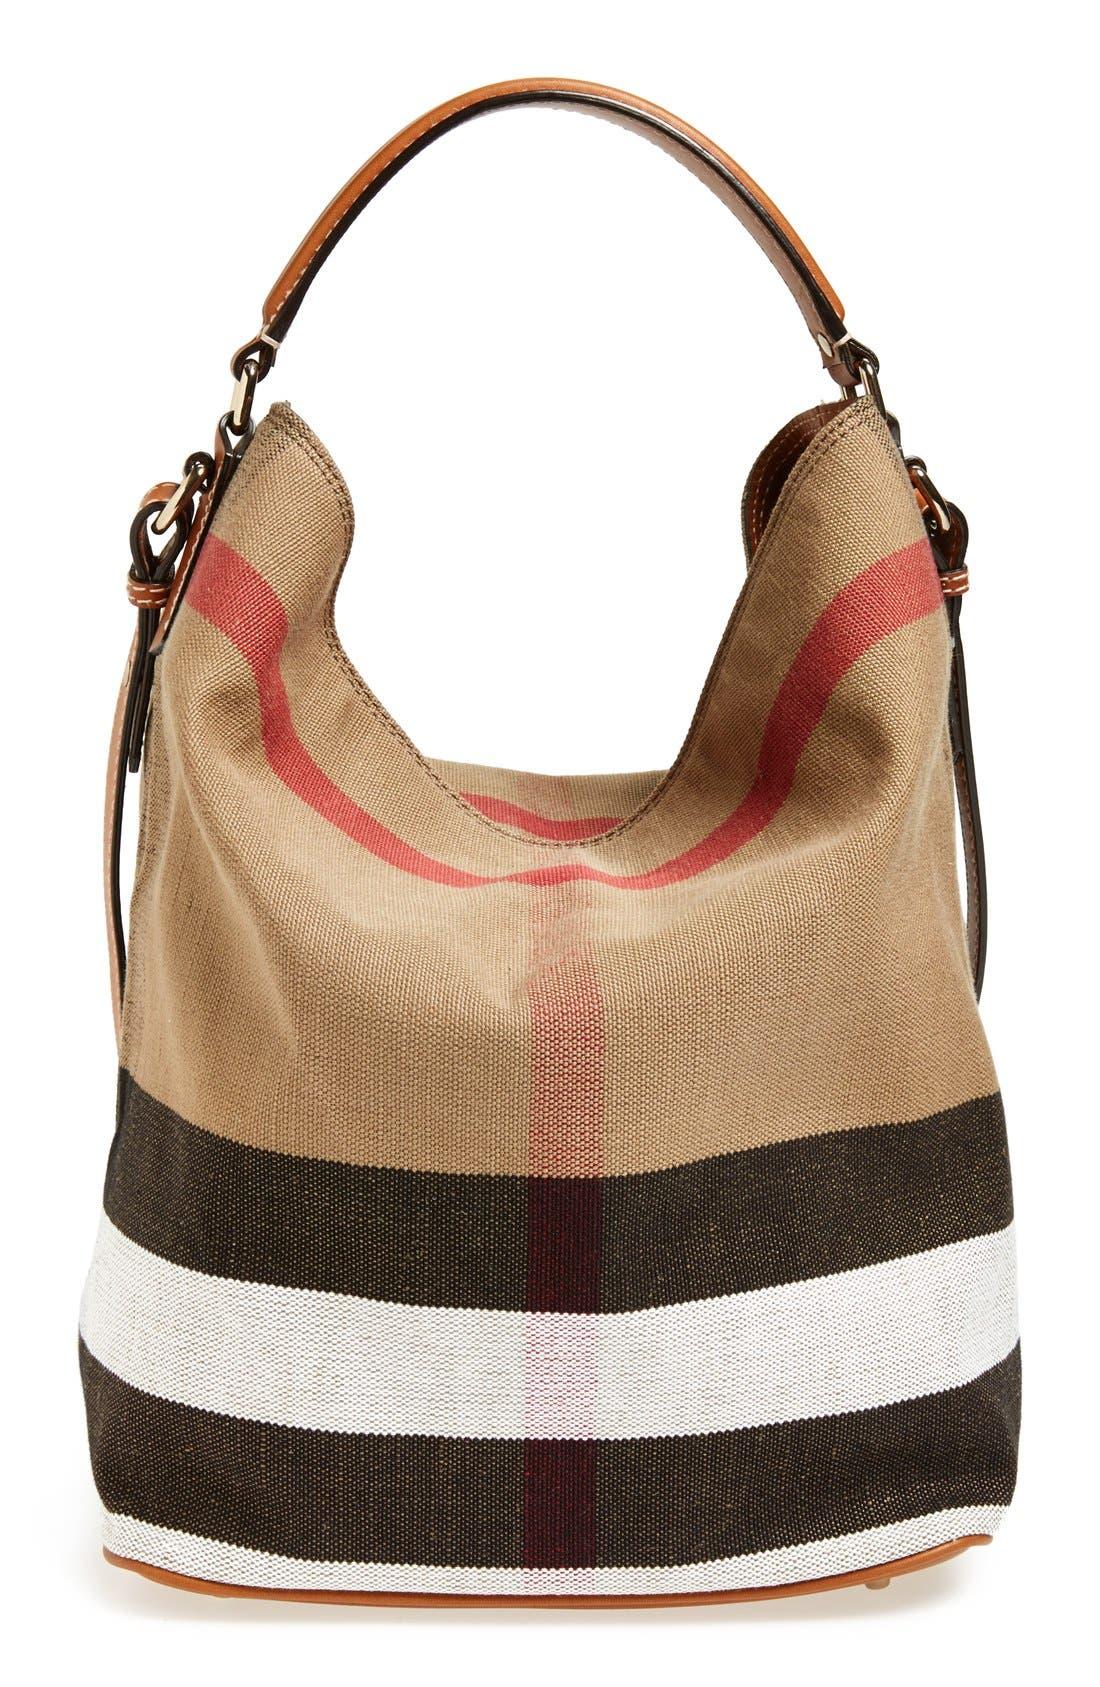 Burberry Medium Ashby Check Print Bucket Bag